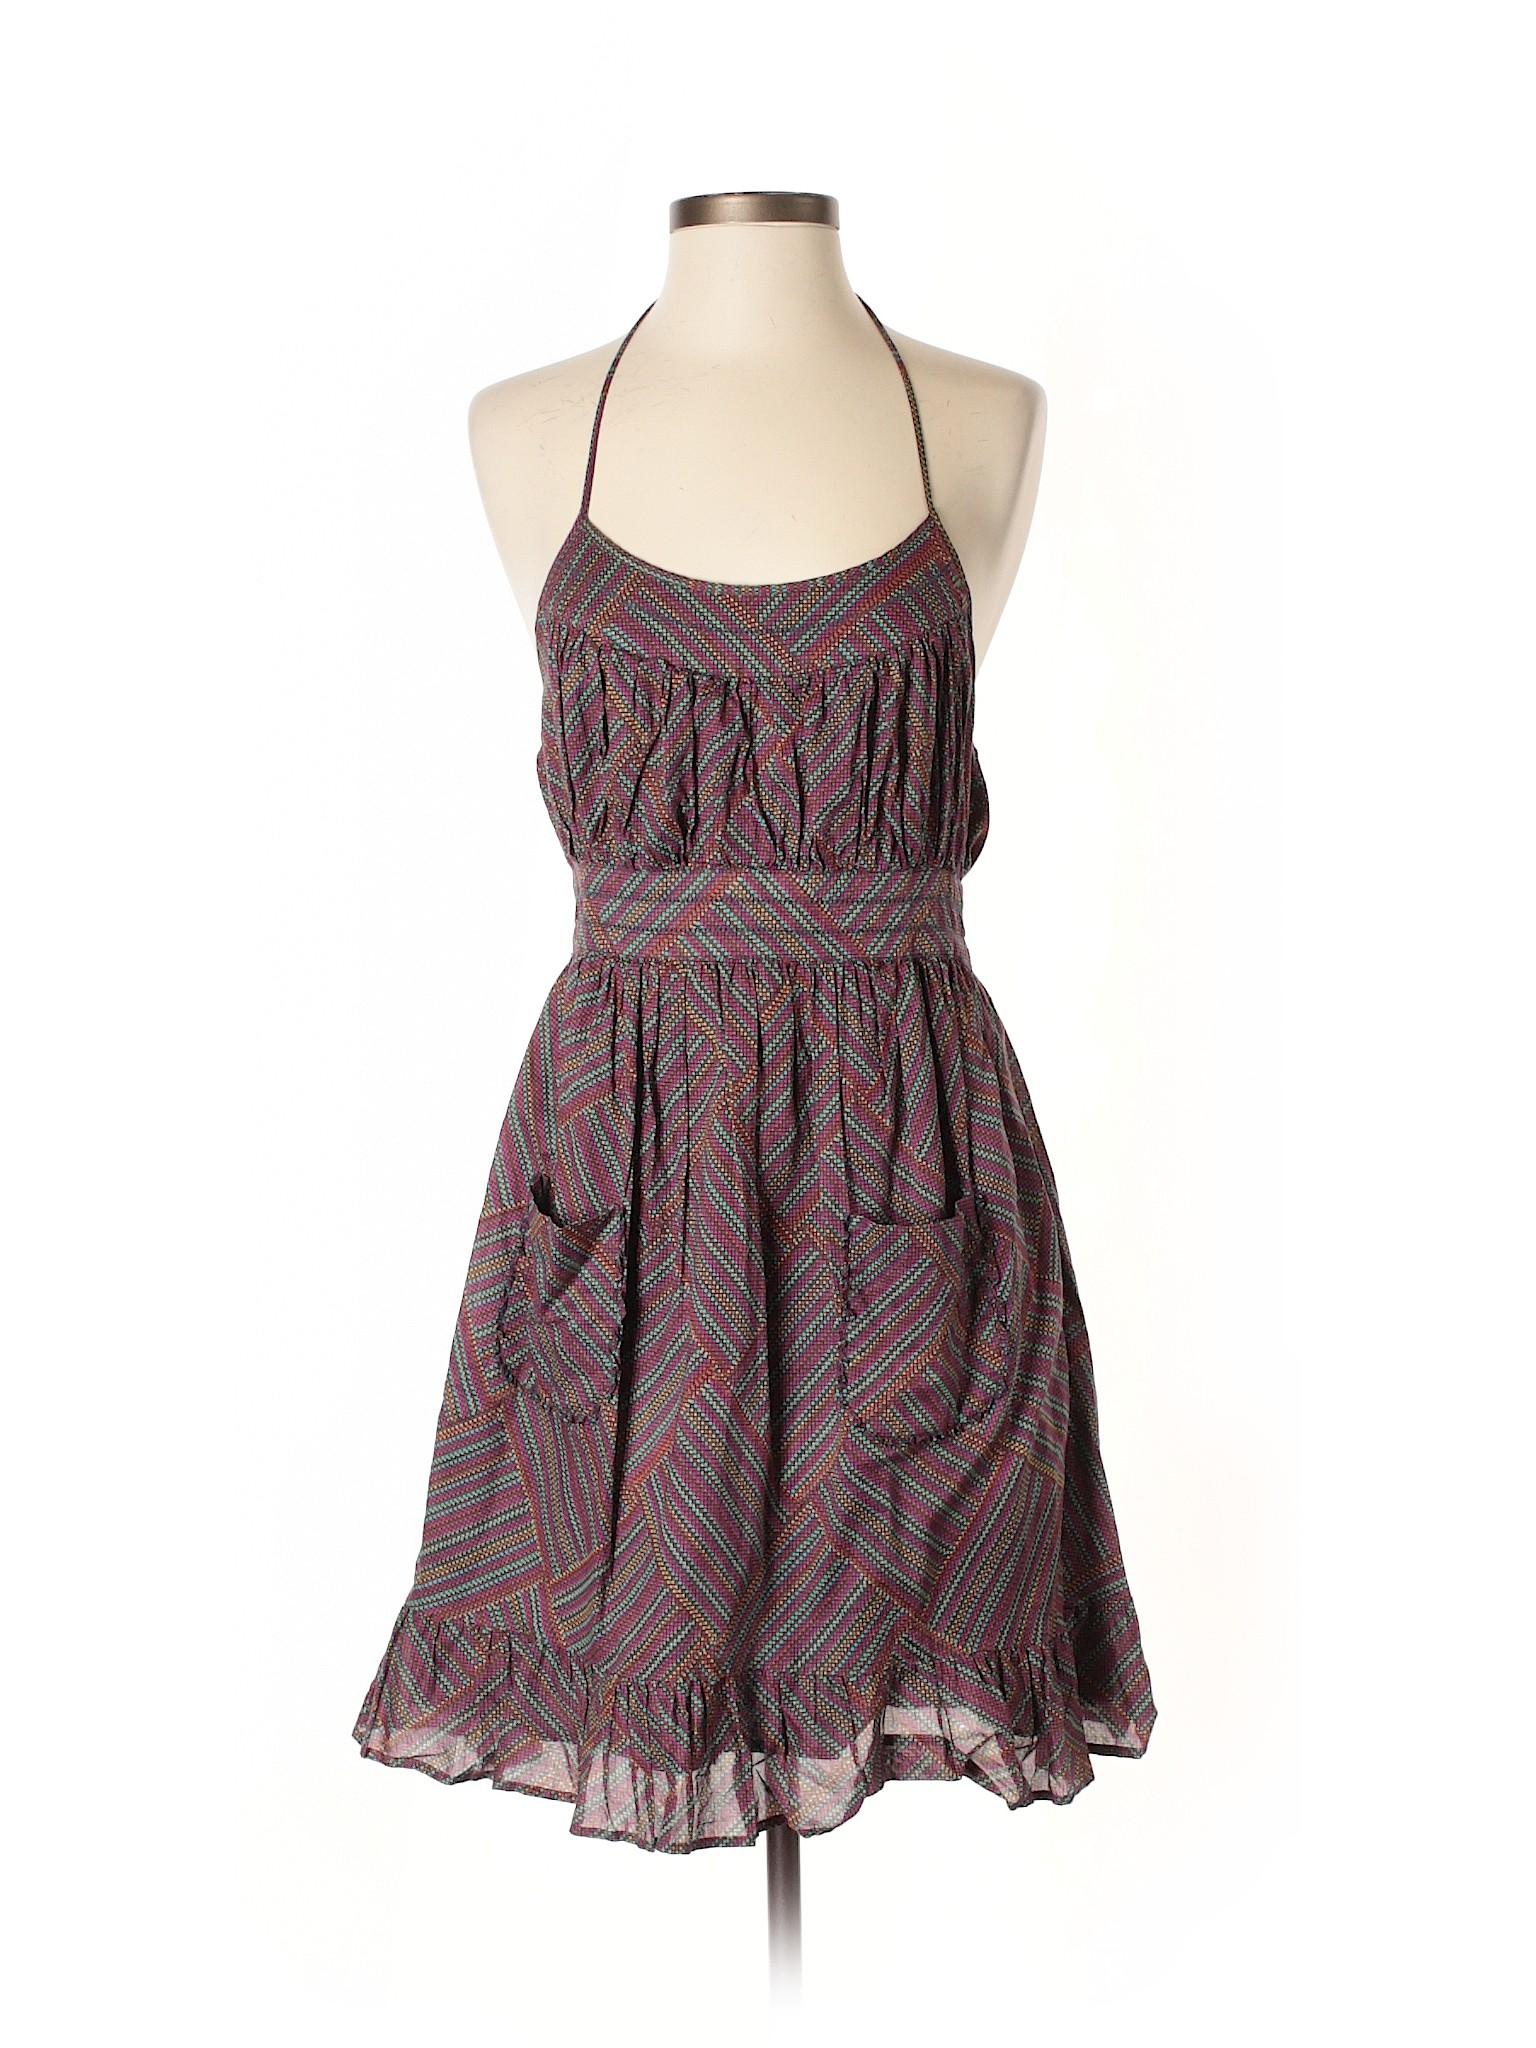 Ecote Casual winter winter Ecote Dress Boutique Boutique Boutique Dress Casual W8YU1Hw0